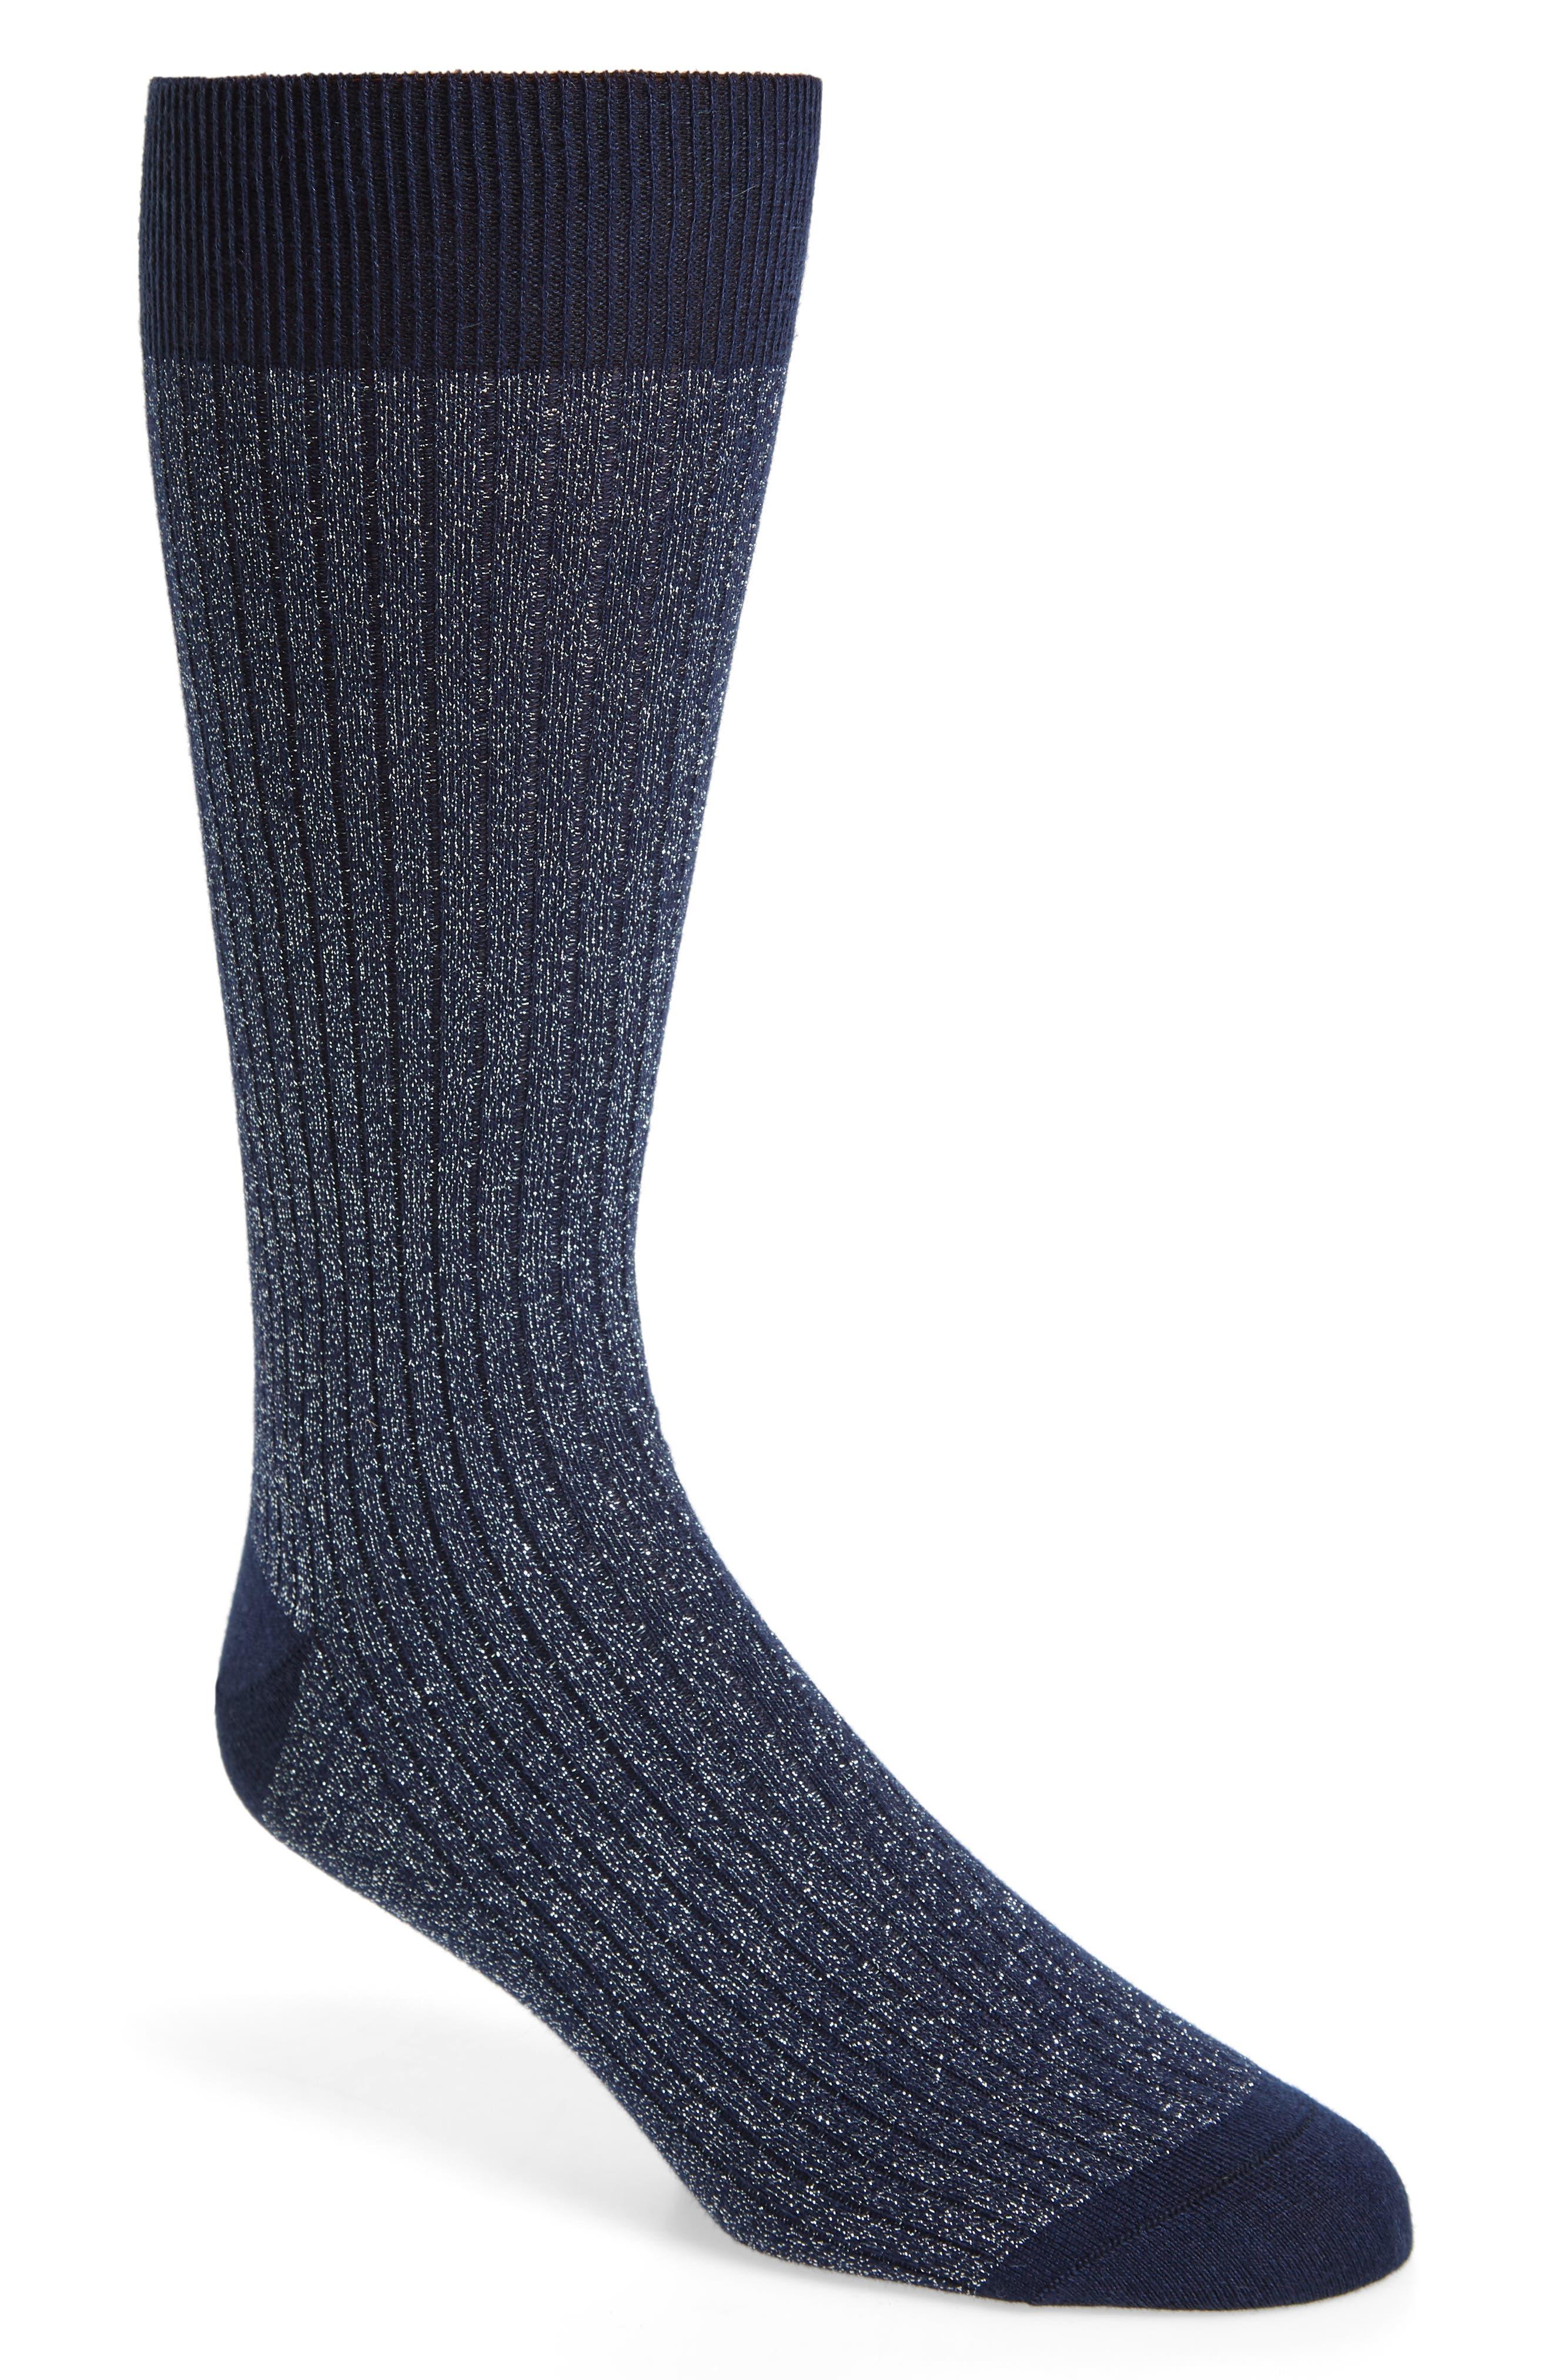 Sparkle Socks,                             Main thumbnail 1, color,                             NAVY